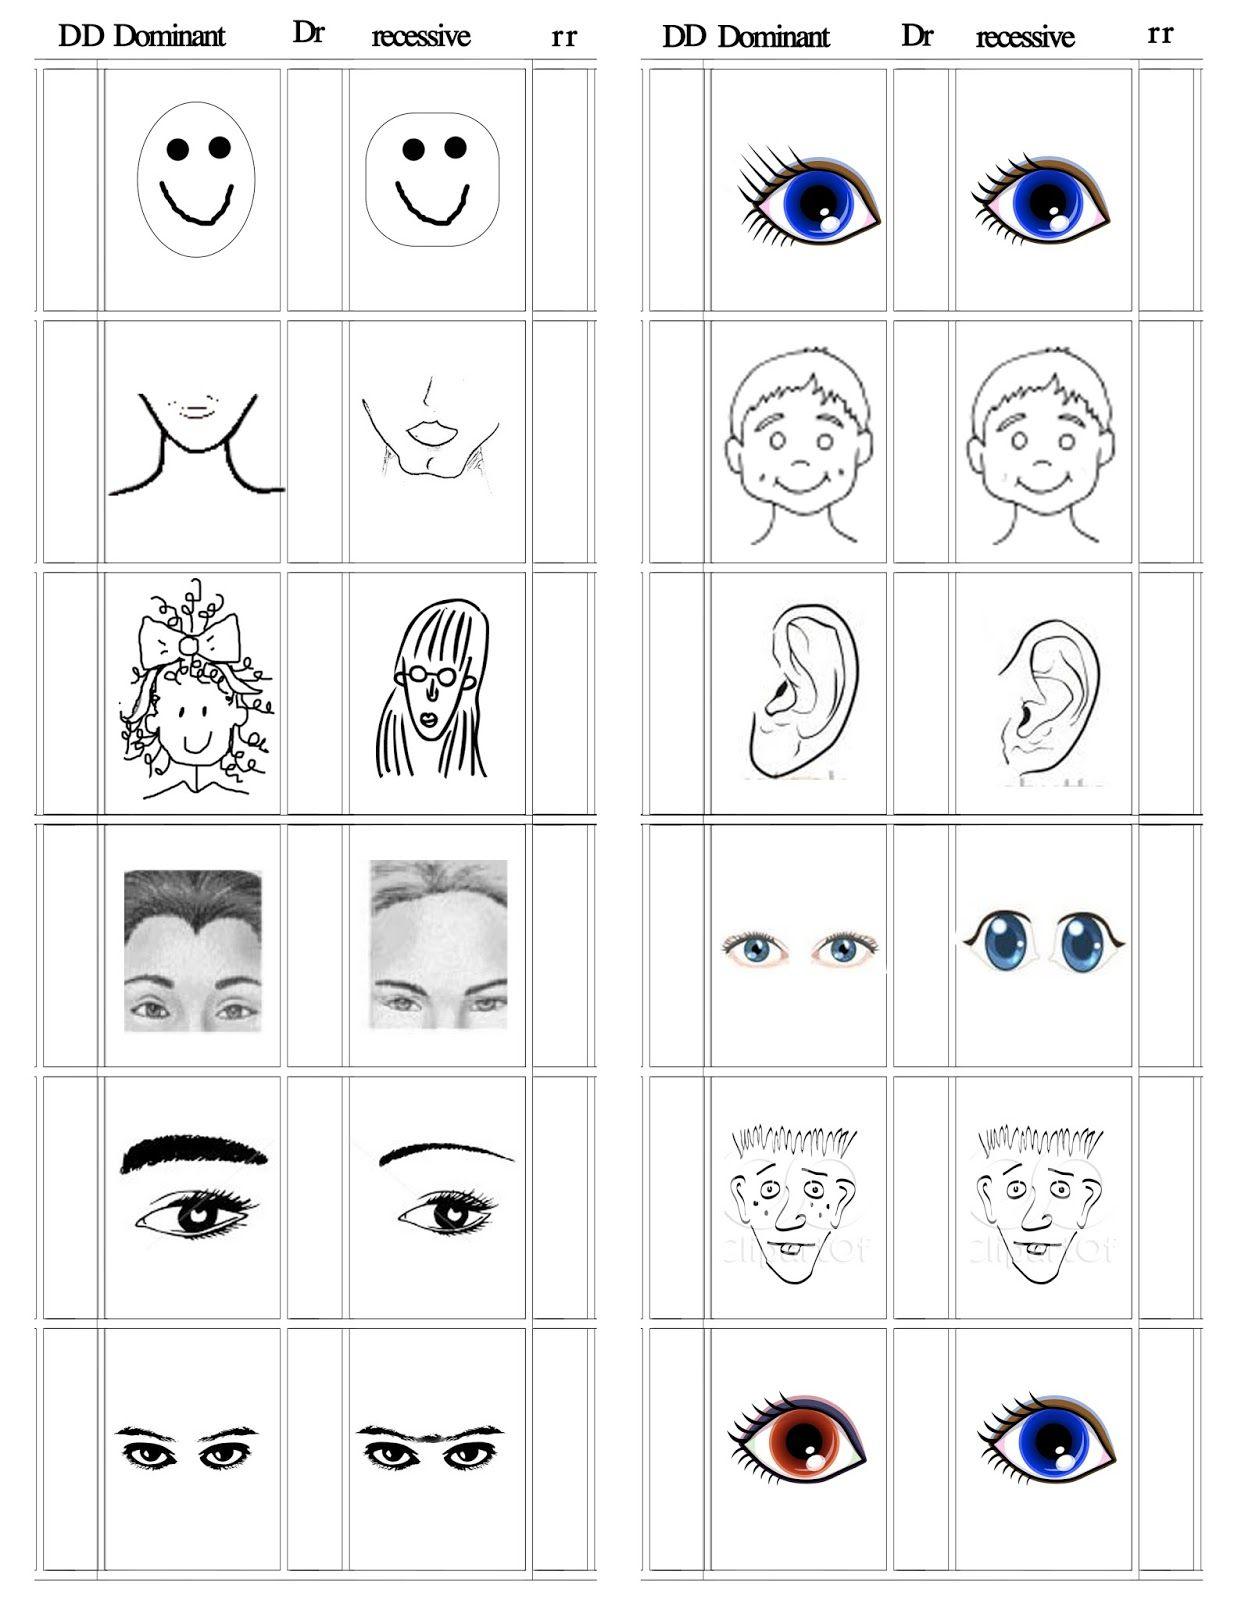 Genetics Preschool Worksheets For Kids Fun Worksheets For Kids Fun Worksheets [ 1600 x 1234 Pixel ]